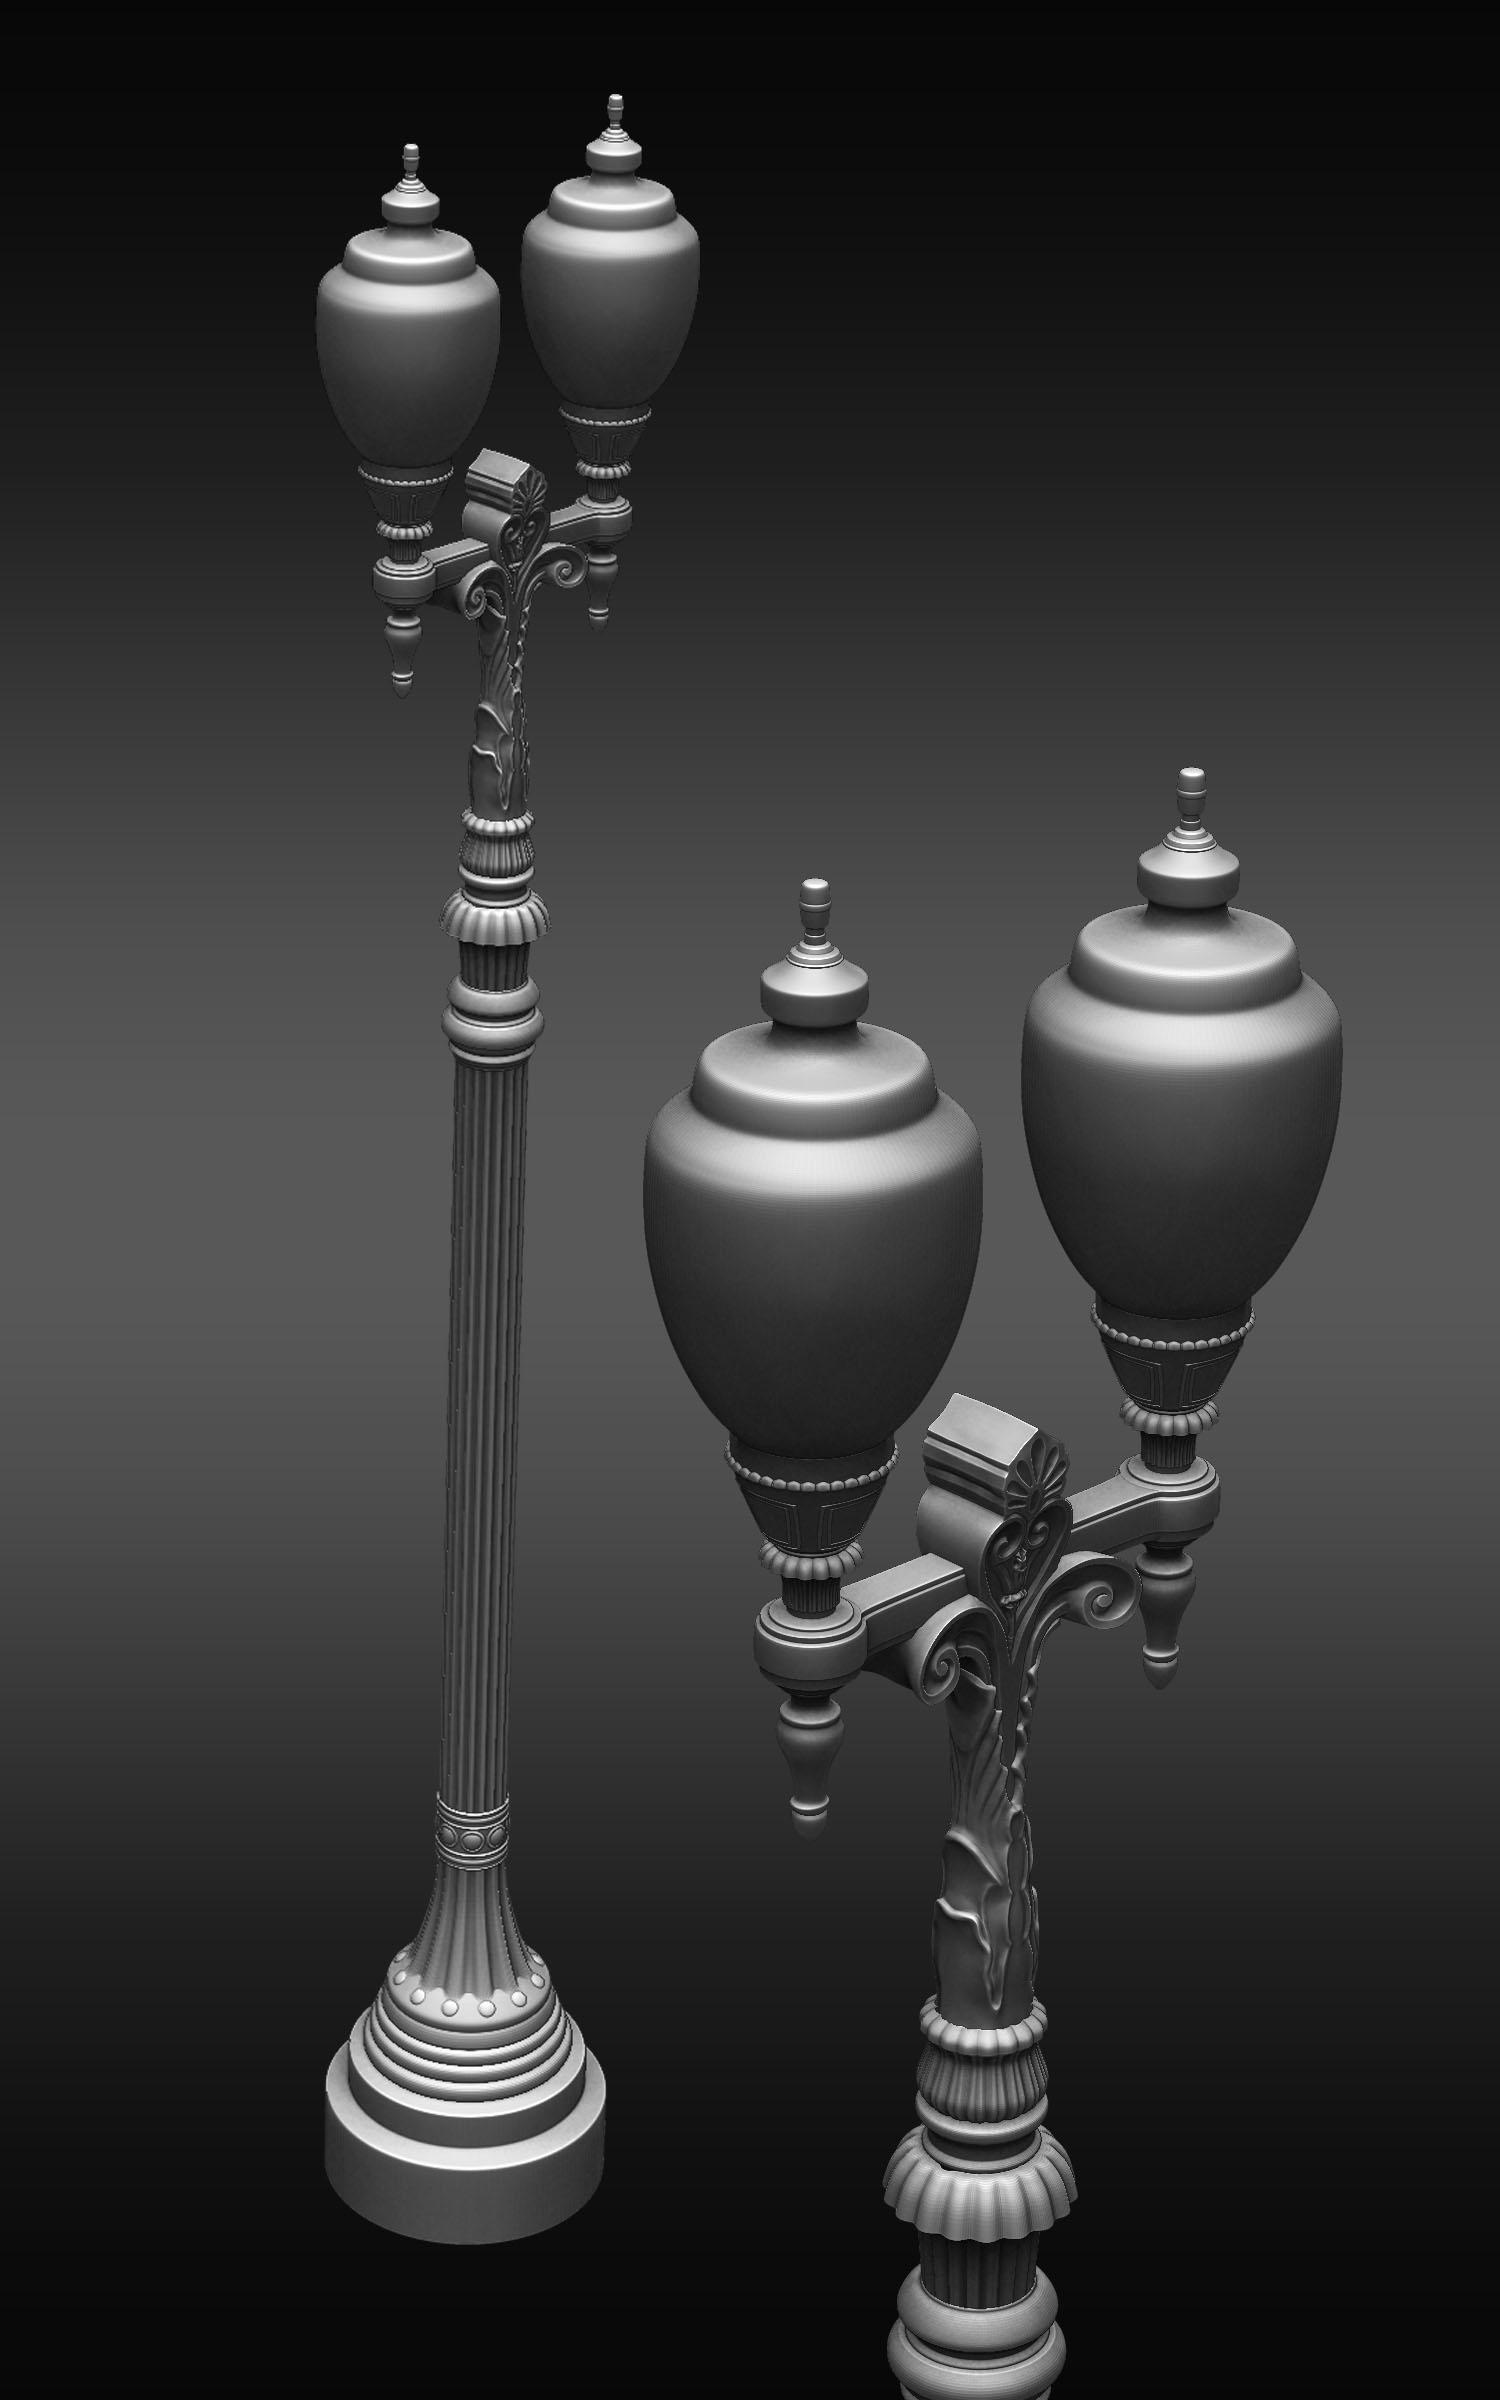 Lamp_Highpoly1.jpg